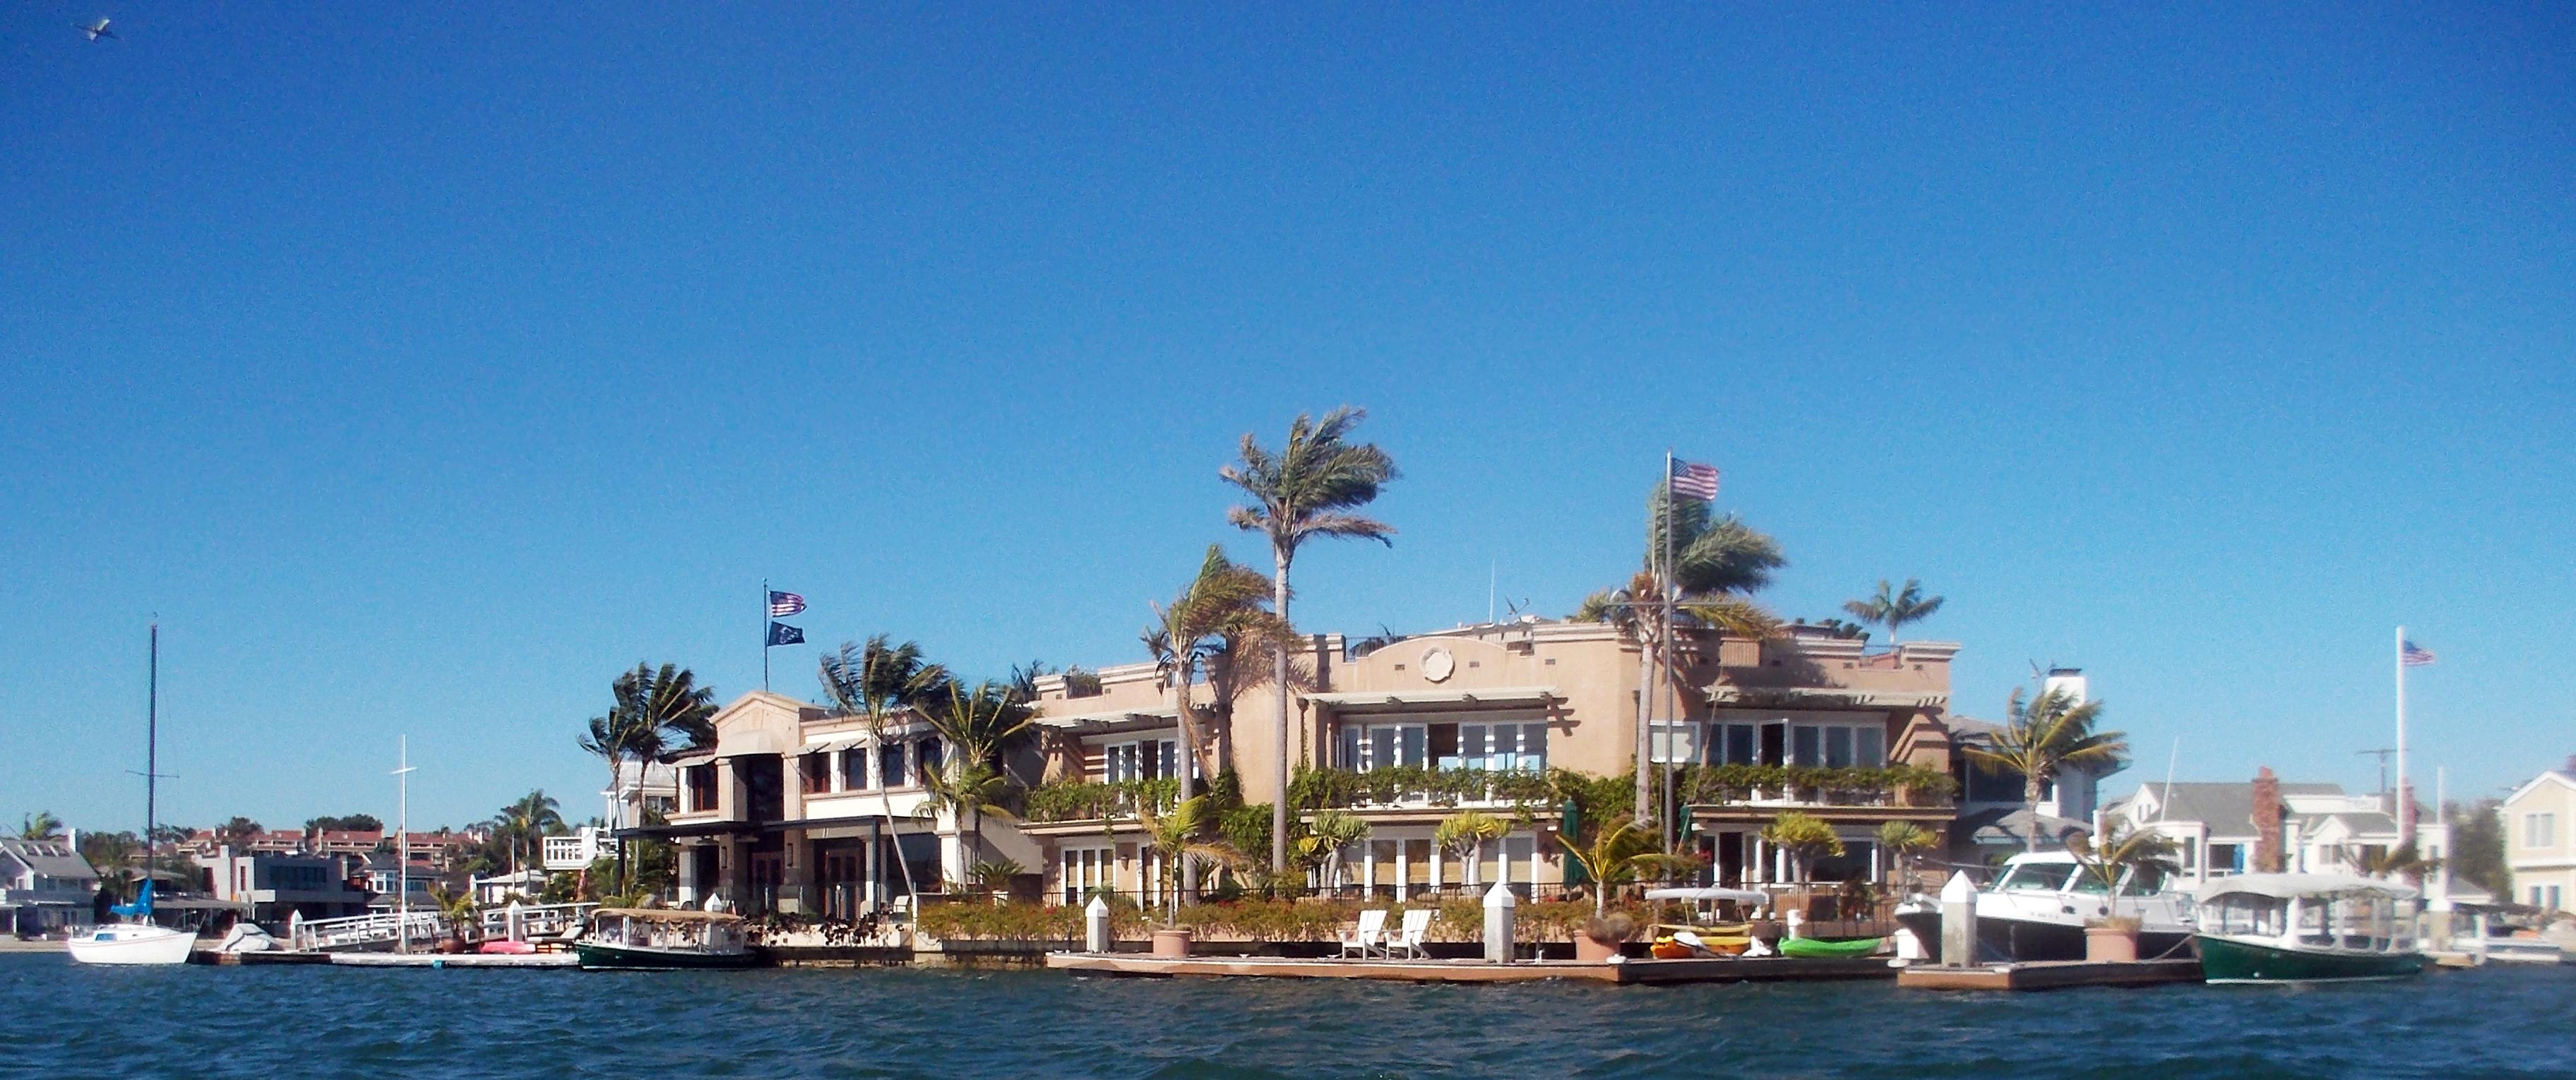 Newport Beach Location